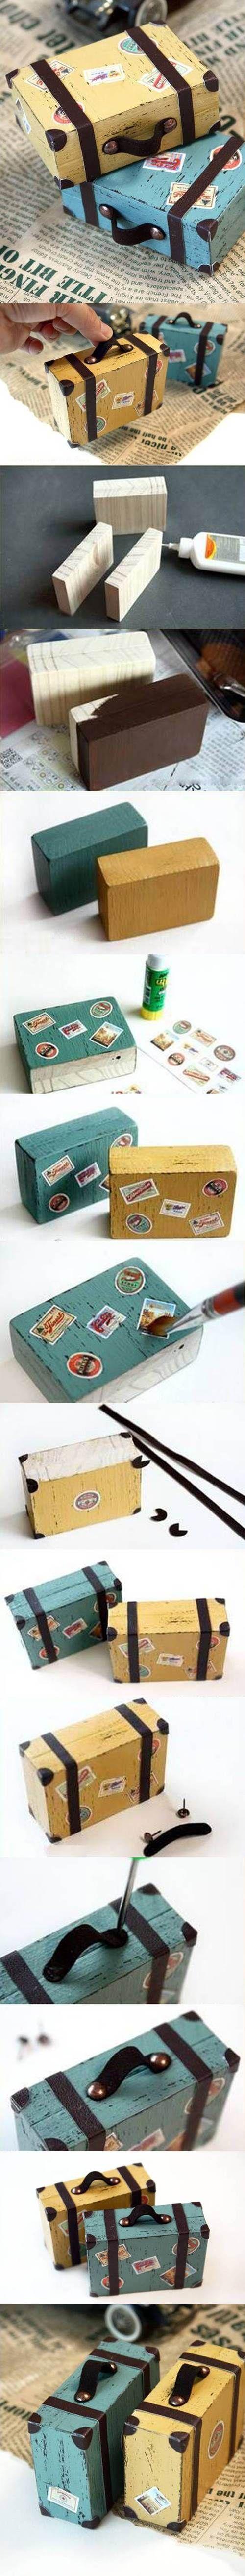 DIY Lovely Mini Suitcase Paperweights   iCreativeIdeas.com Like Us on Facebook ==> https://www.facebook.com/icreativeideas